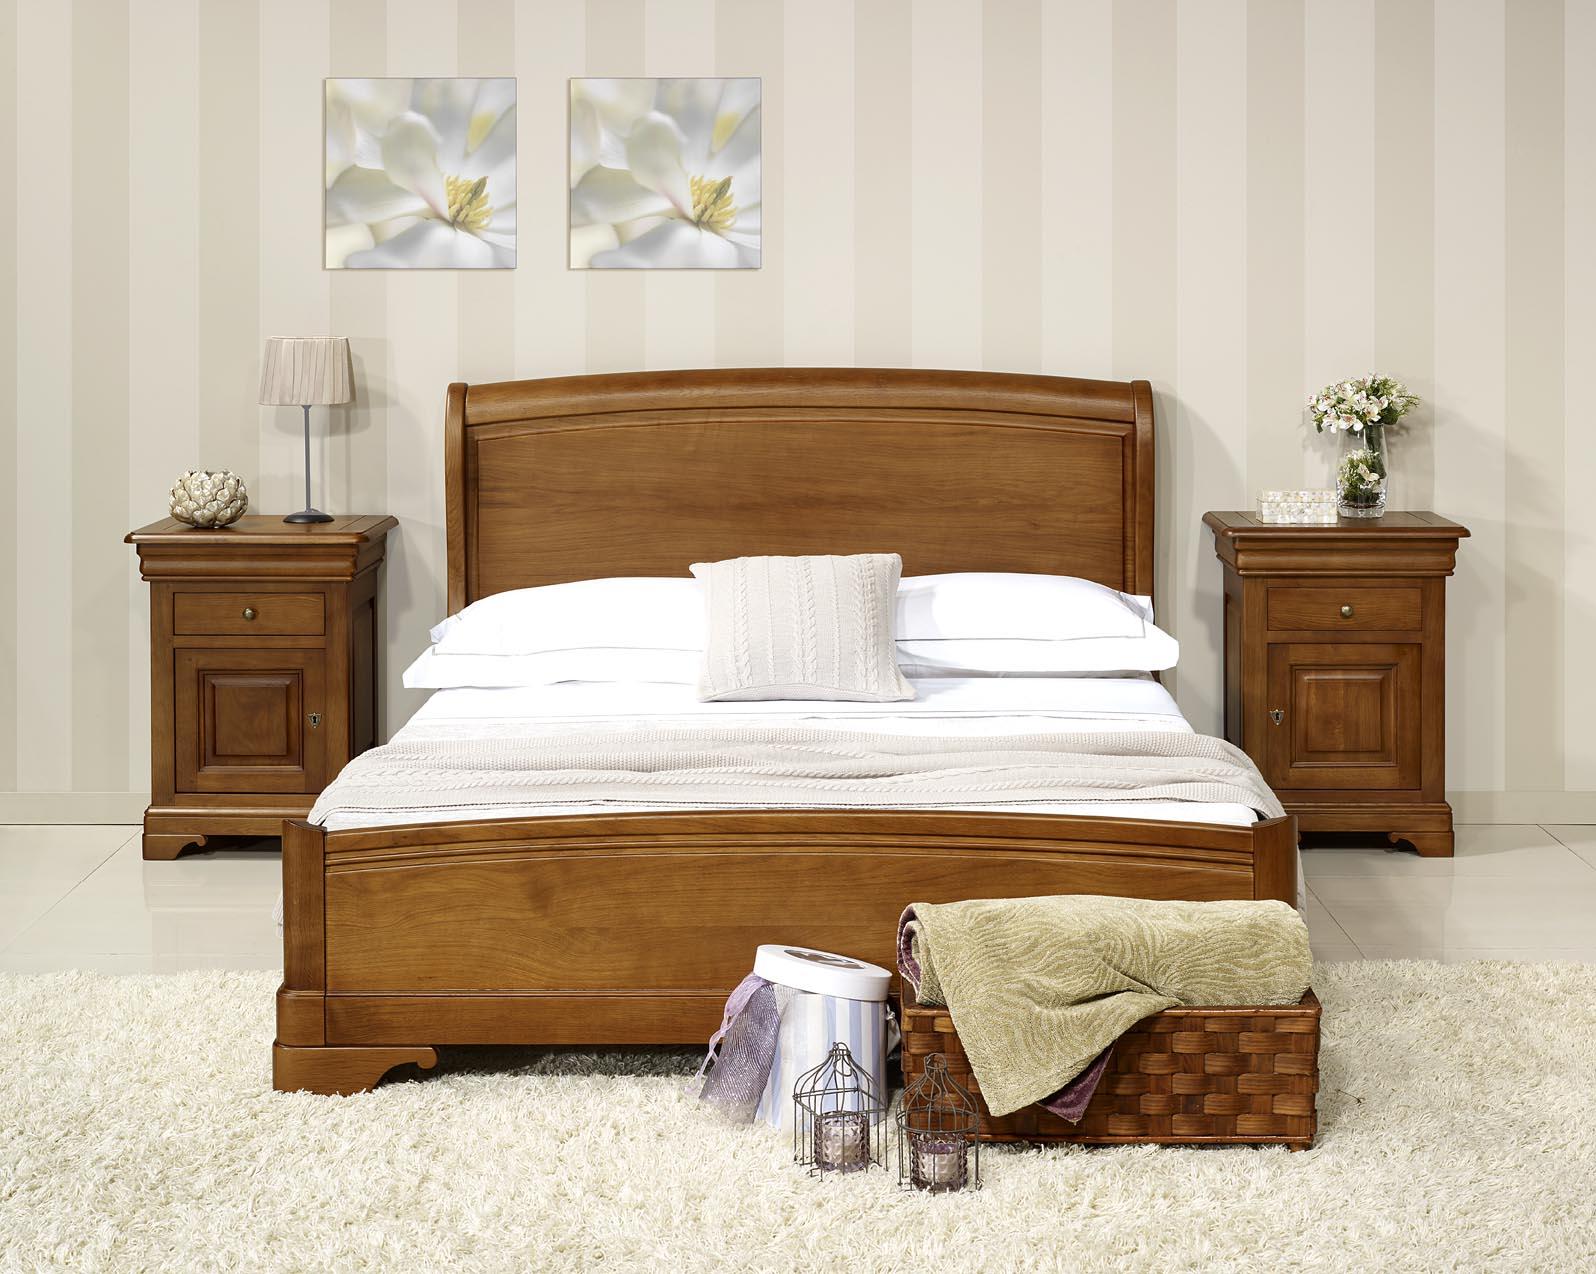 lit jean baptiste 140x190 en ch ne massif de style louis. Black Bedroom Furniture Sets. Home Design Ideas